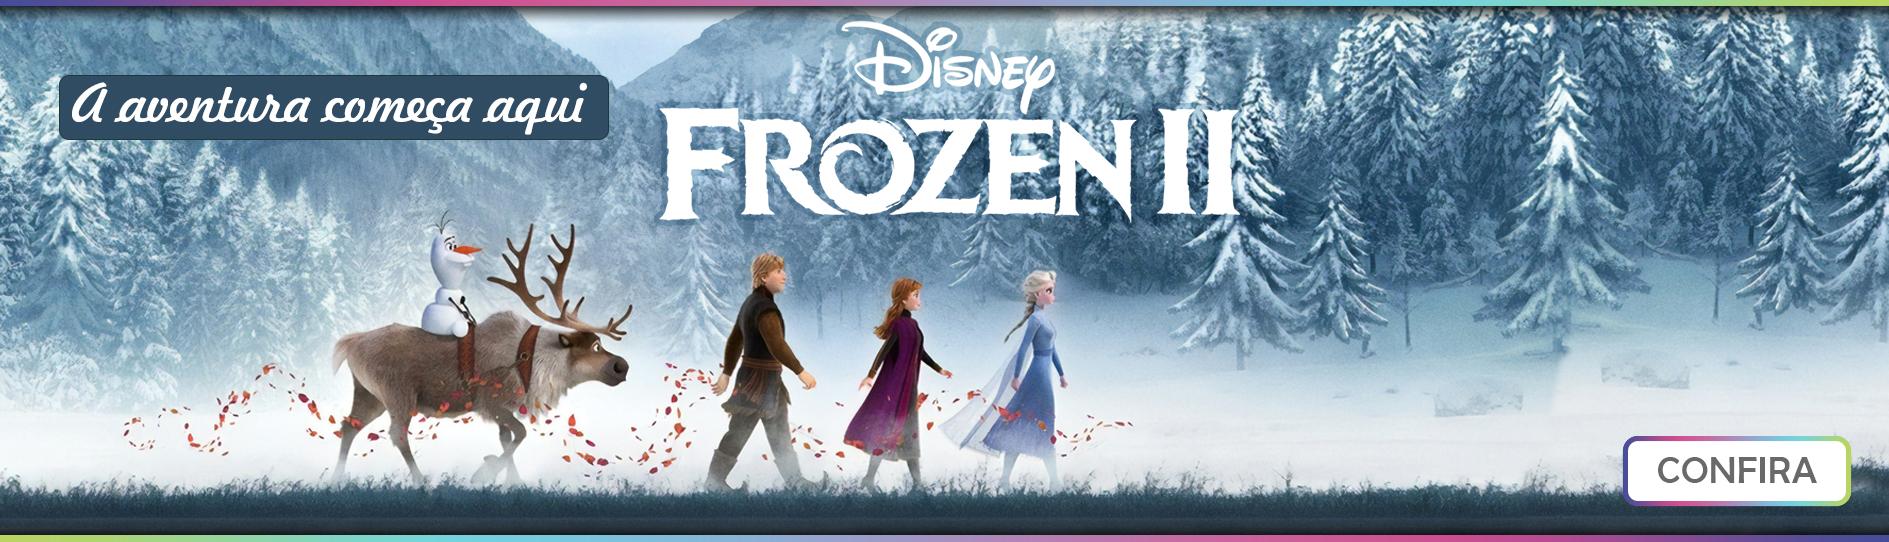 Banner principal Frozen